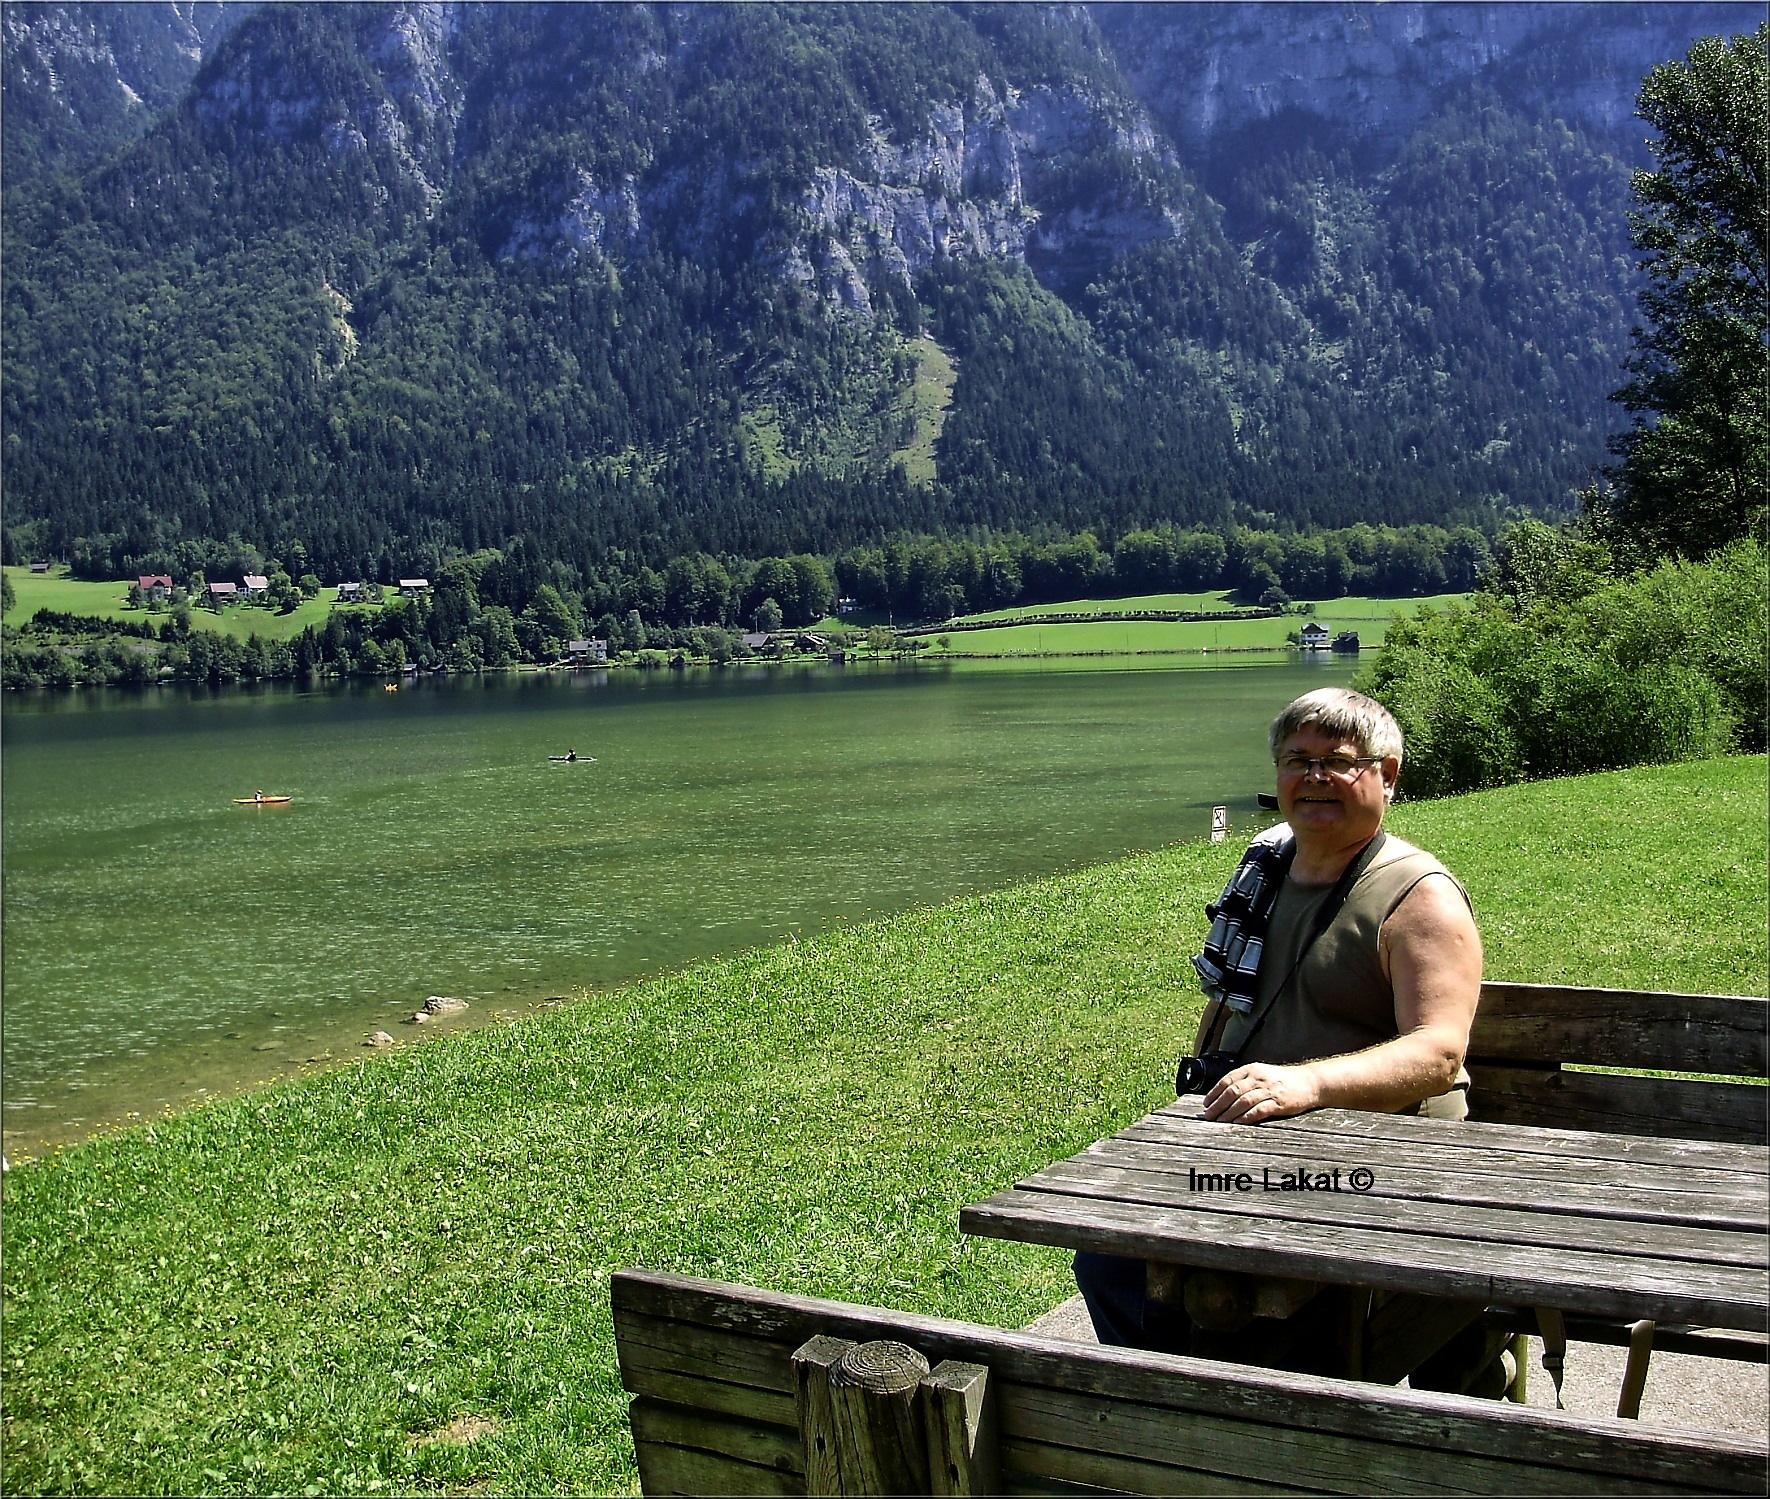 Resting near Hallstättersee  by Imre Lakat